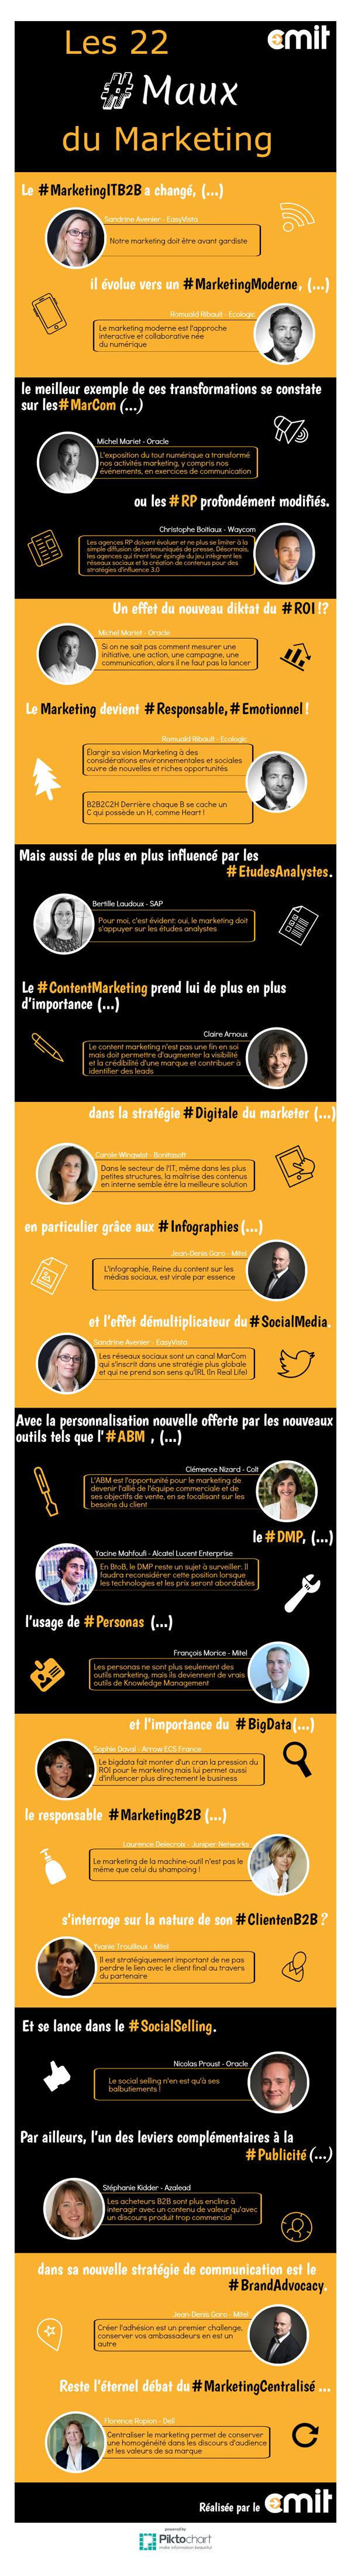 Infographie-CMIT